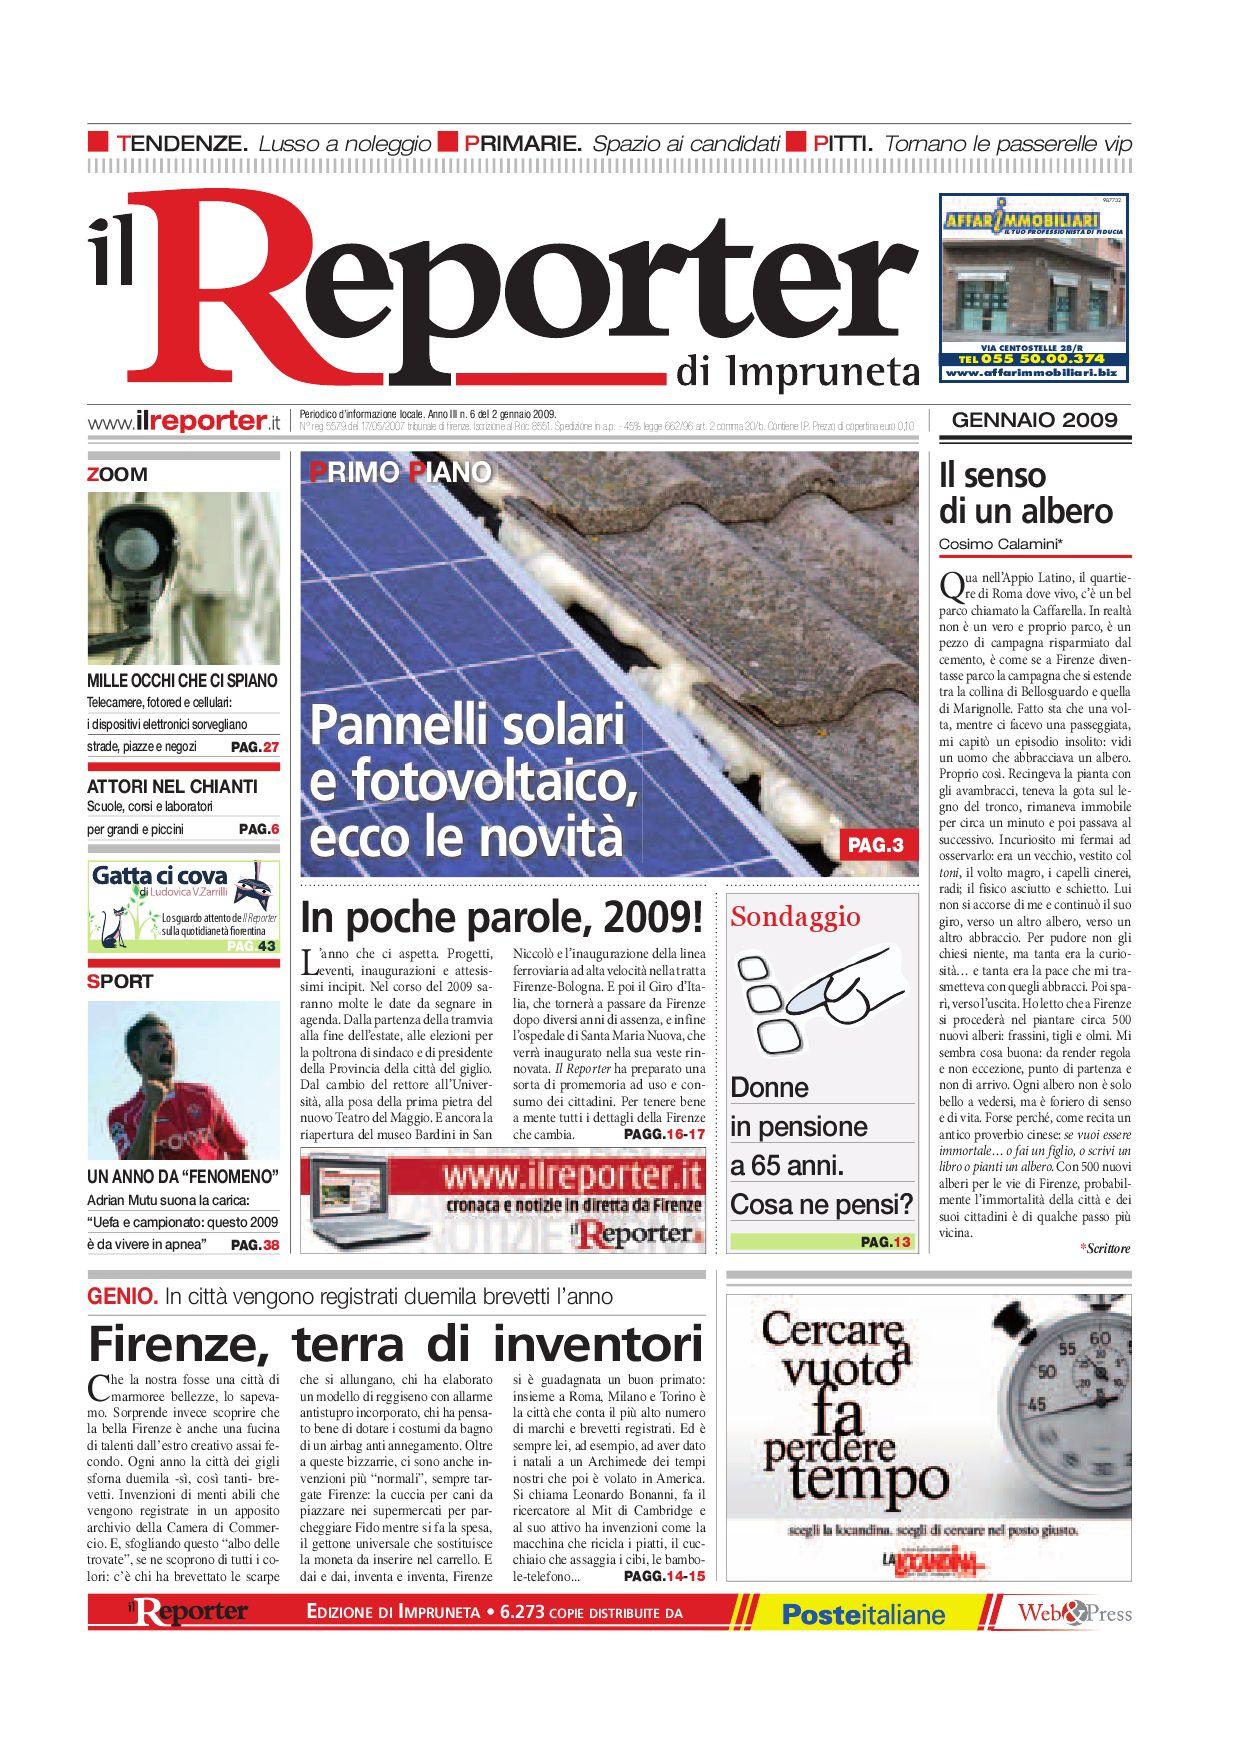 Il reporter-Impruneta-gennaio 2009 by ilreporter - issuu 174285aff25e